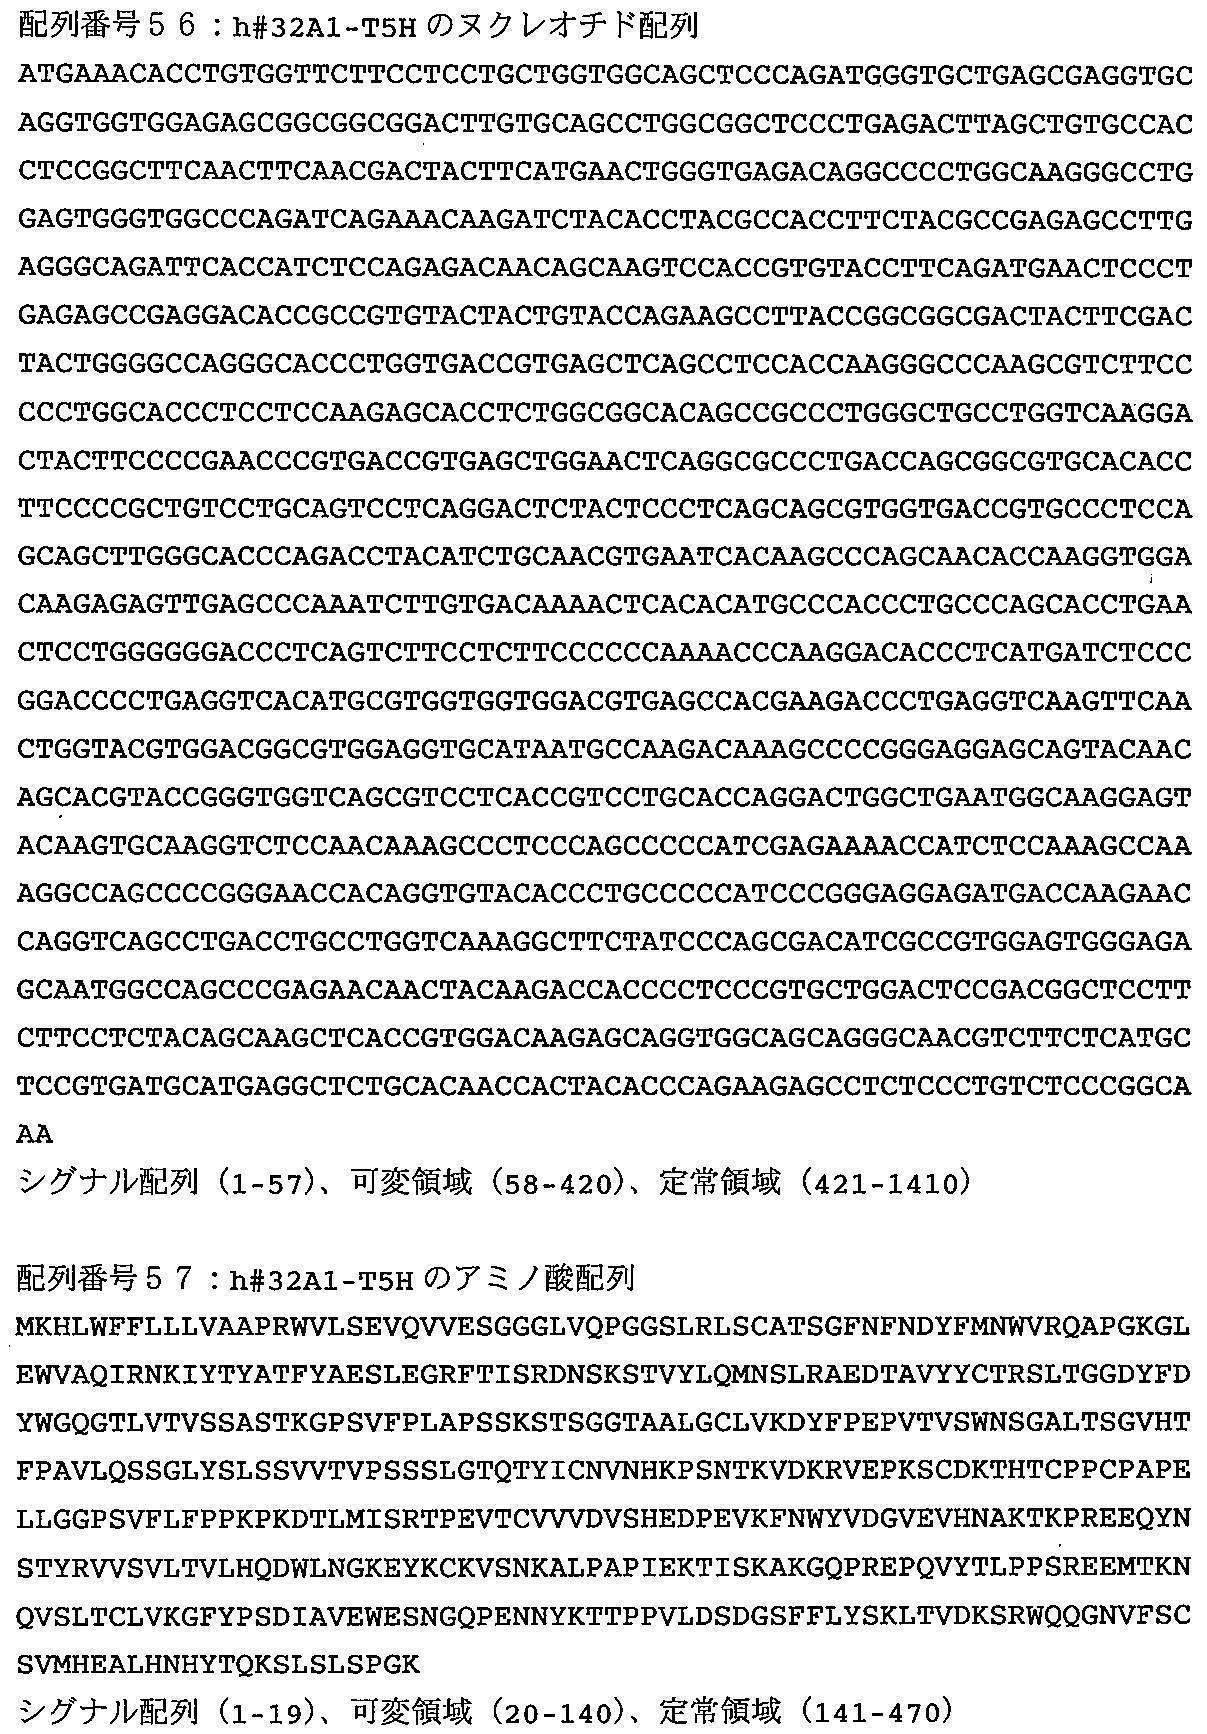 Patent WO2010117011A1 - ANTI-S...